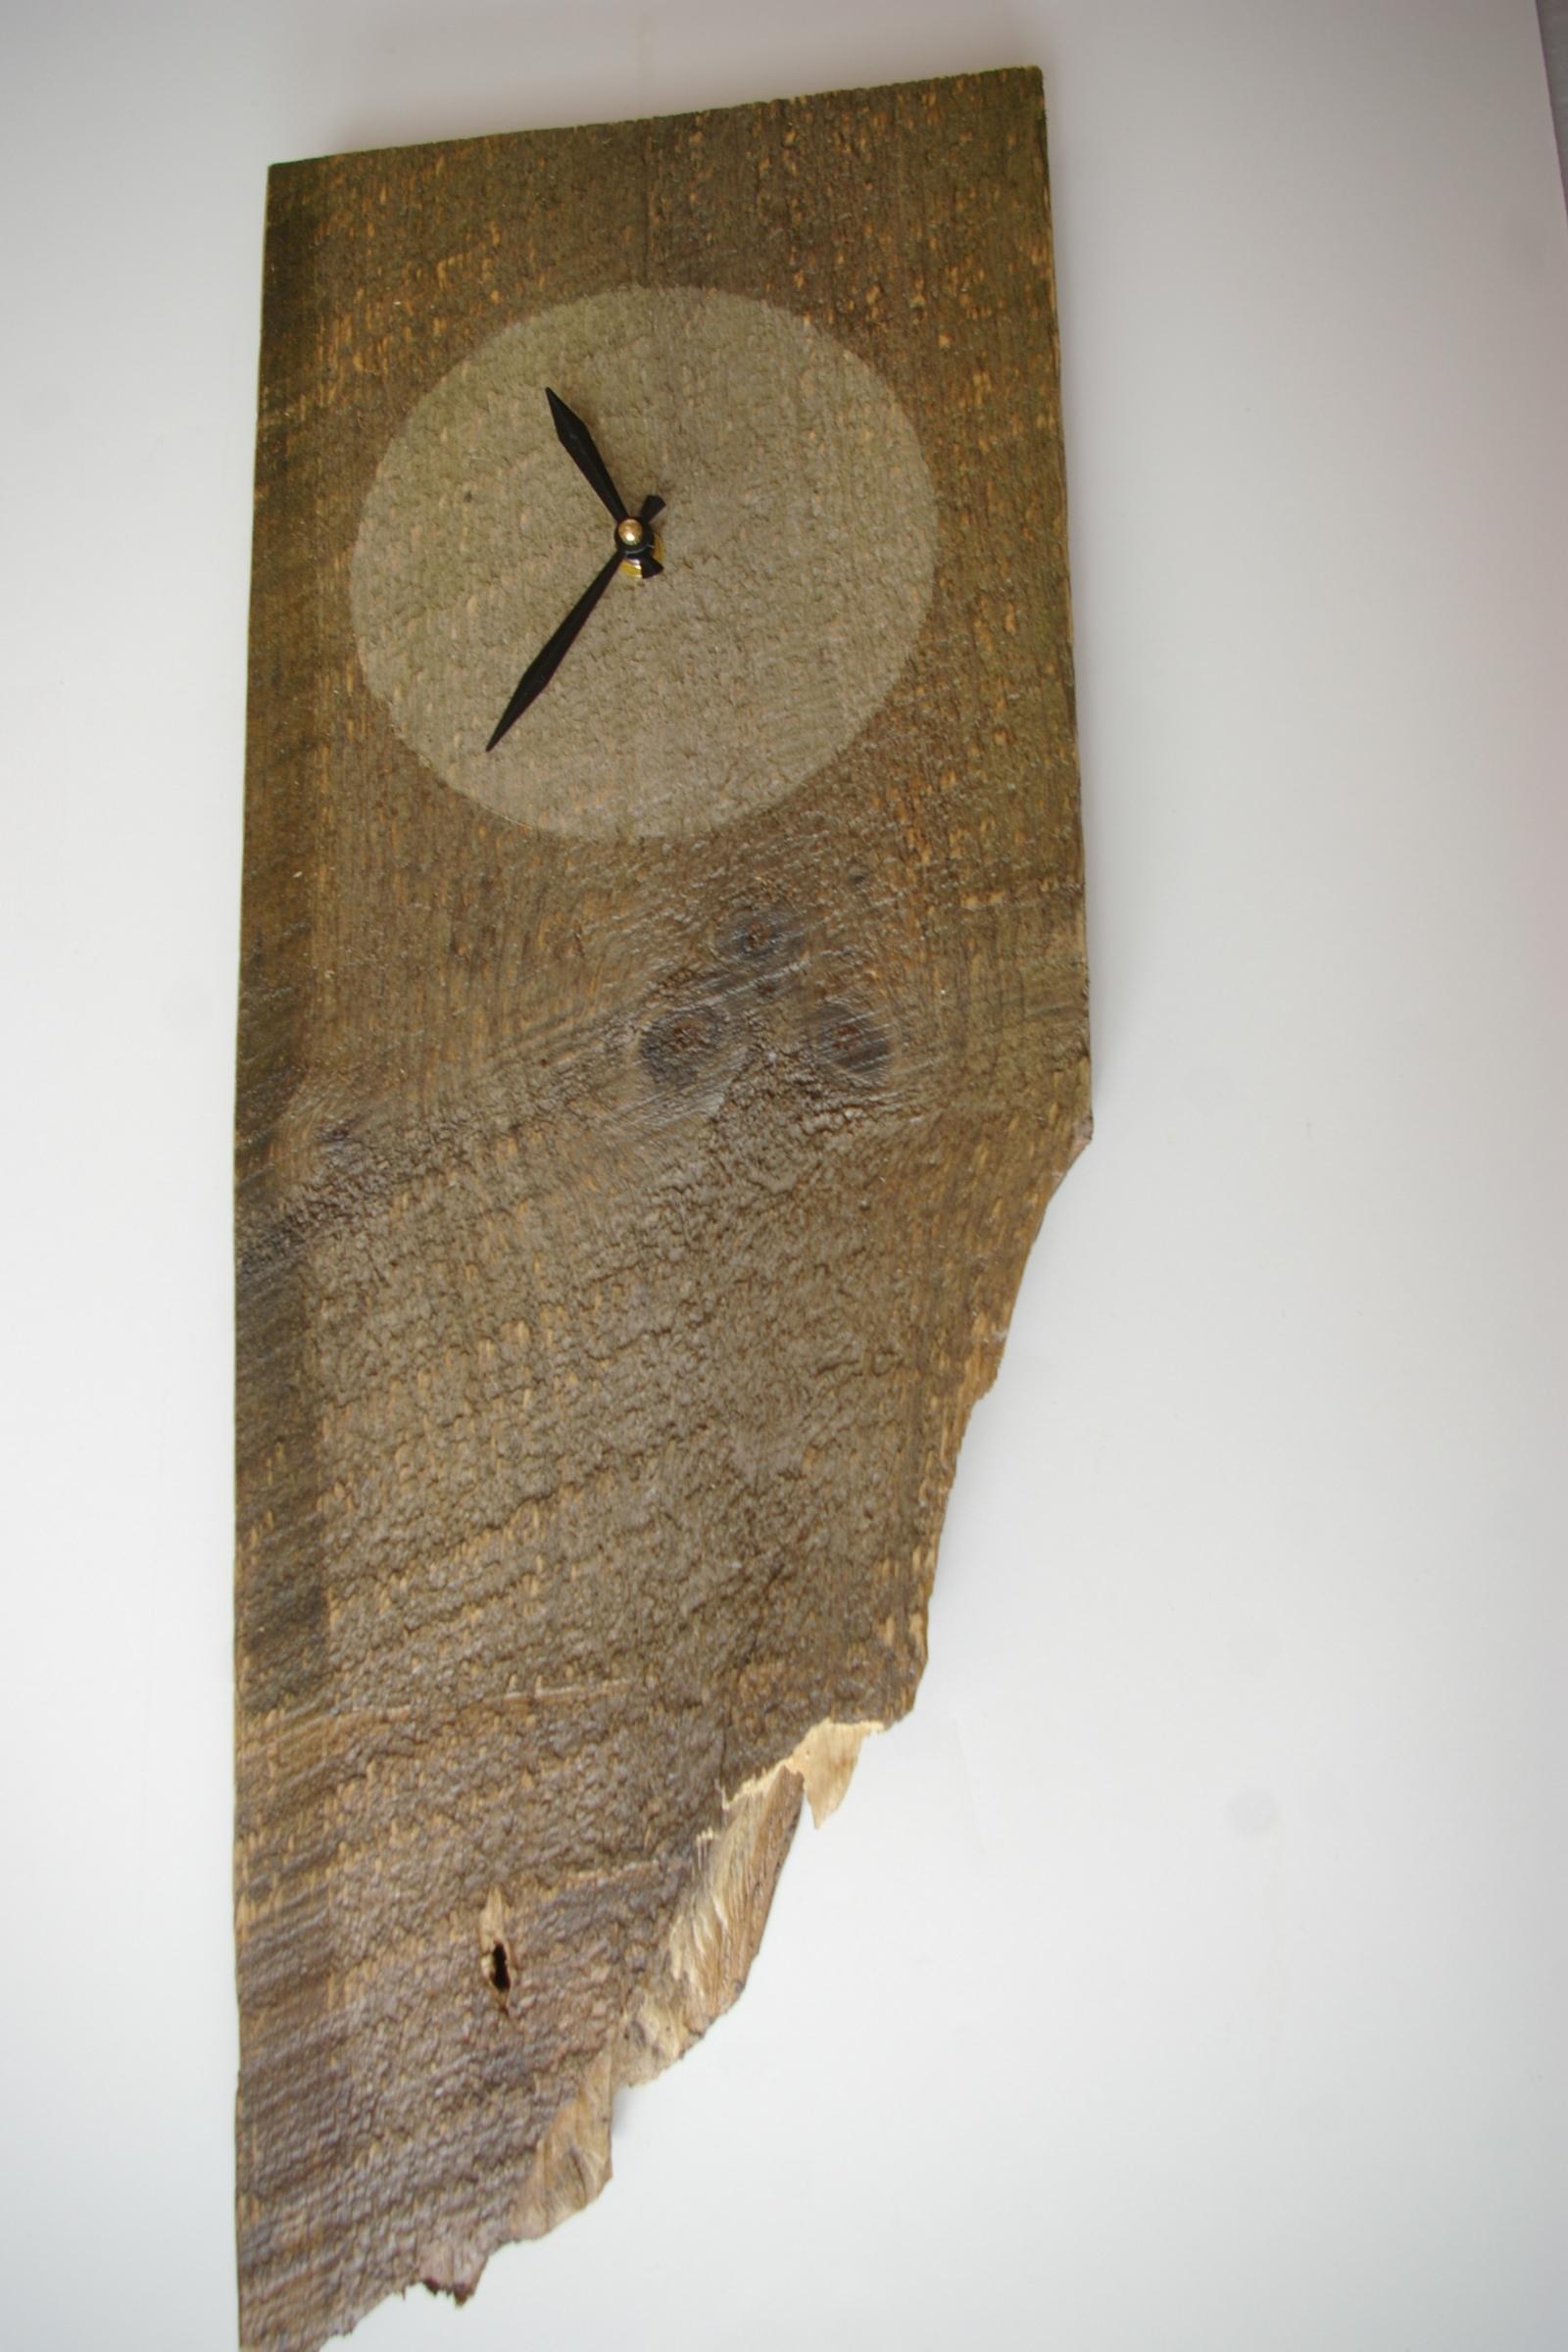 Wall Clock $40 - #503 Reclaimed barn board wall clock, 23